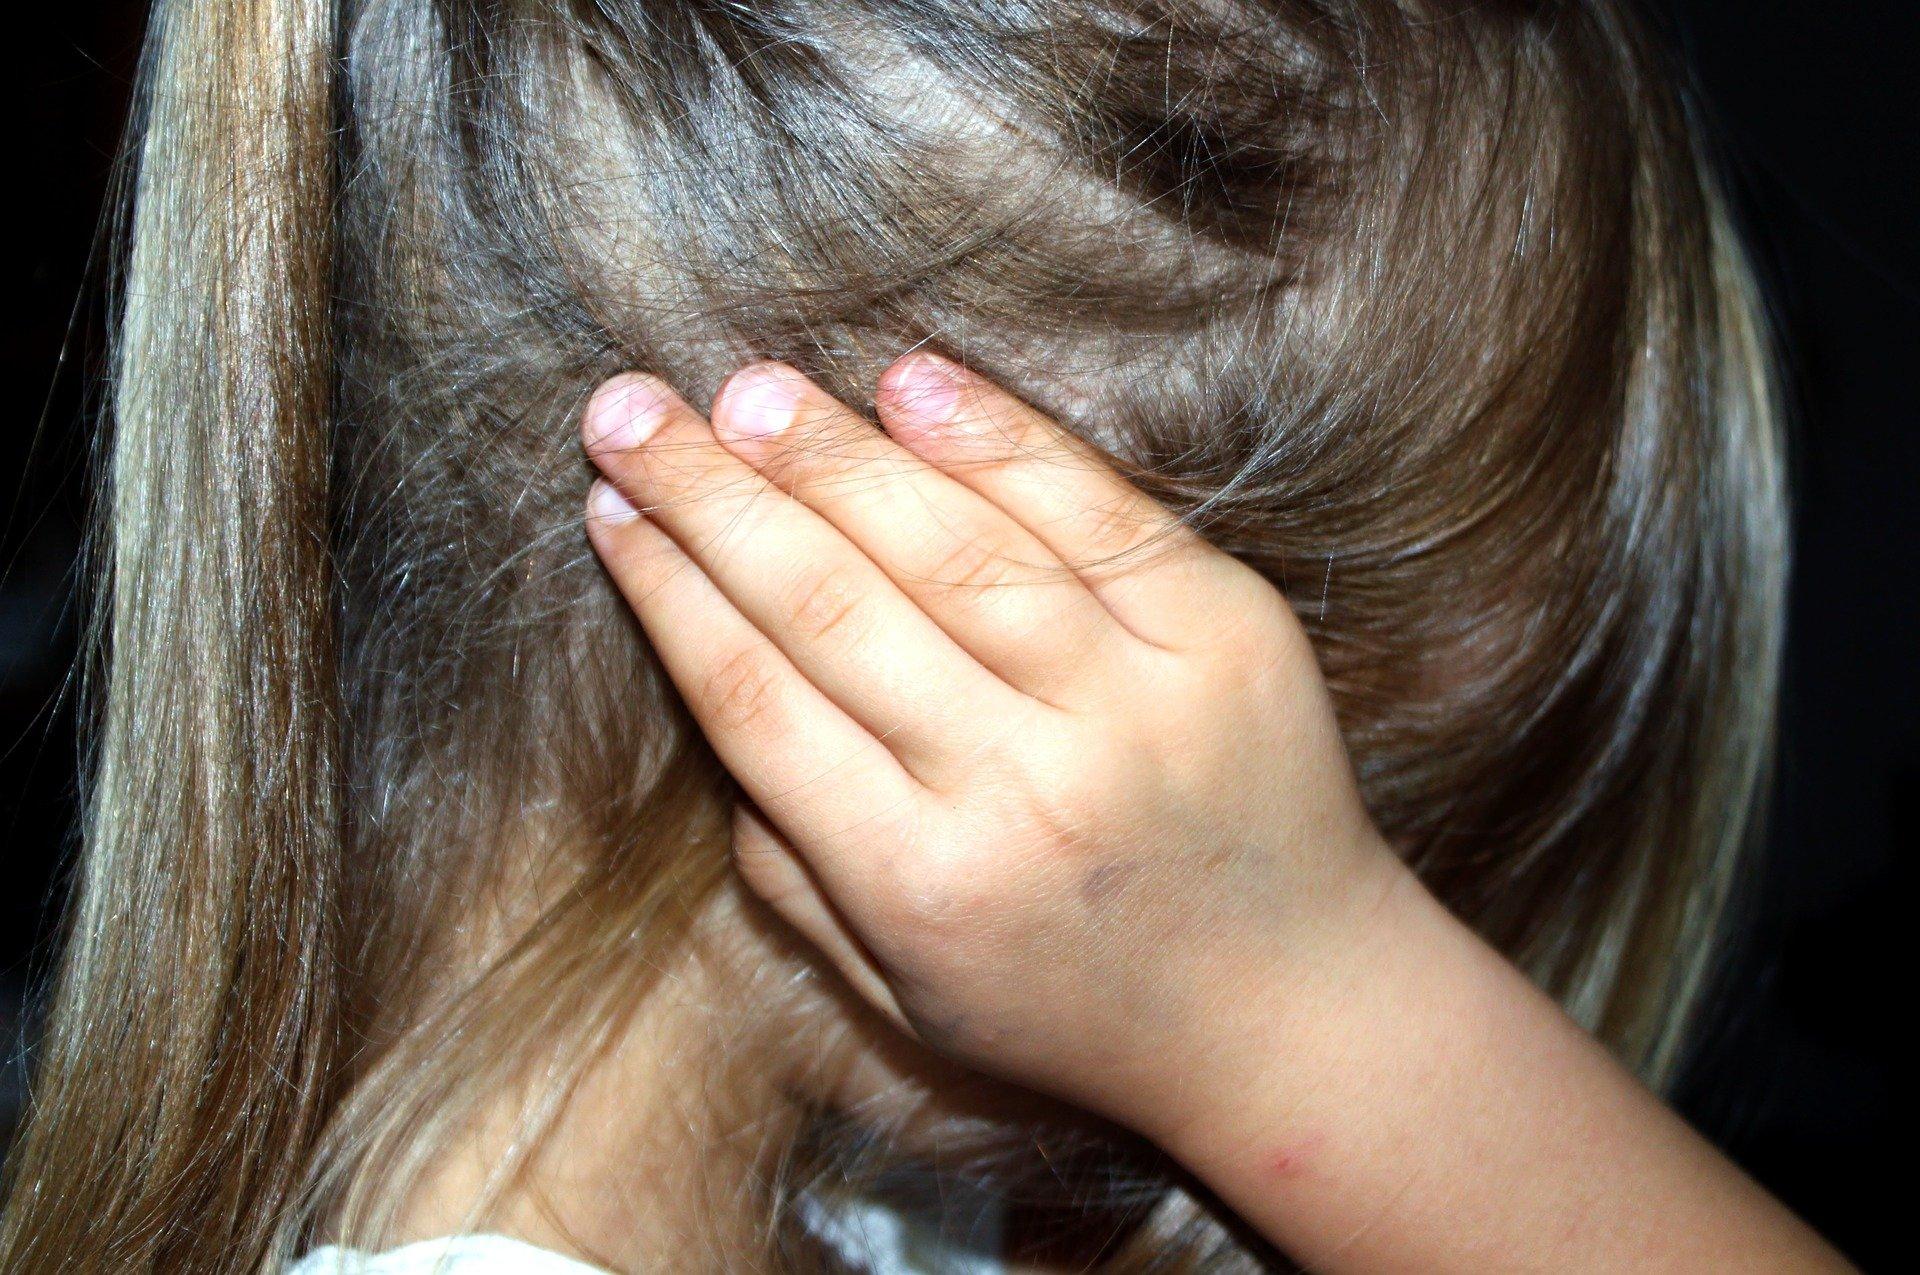 Small child at Child Advocacy Center